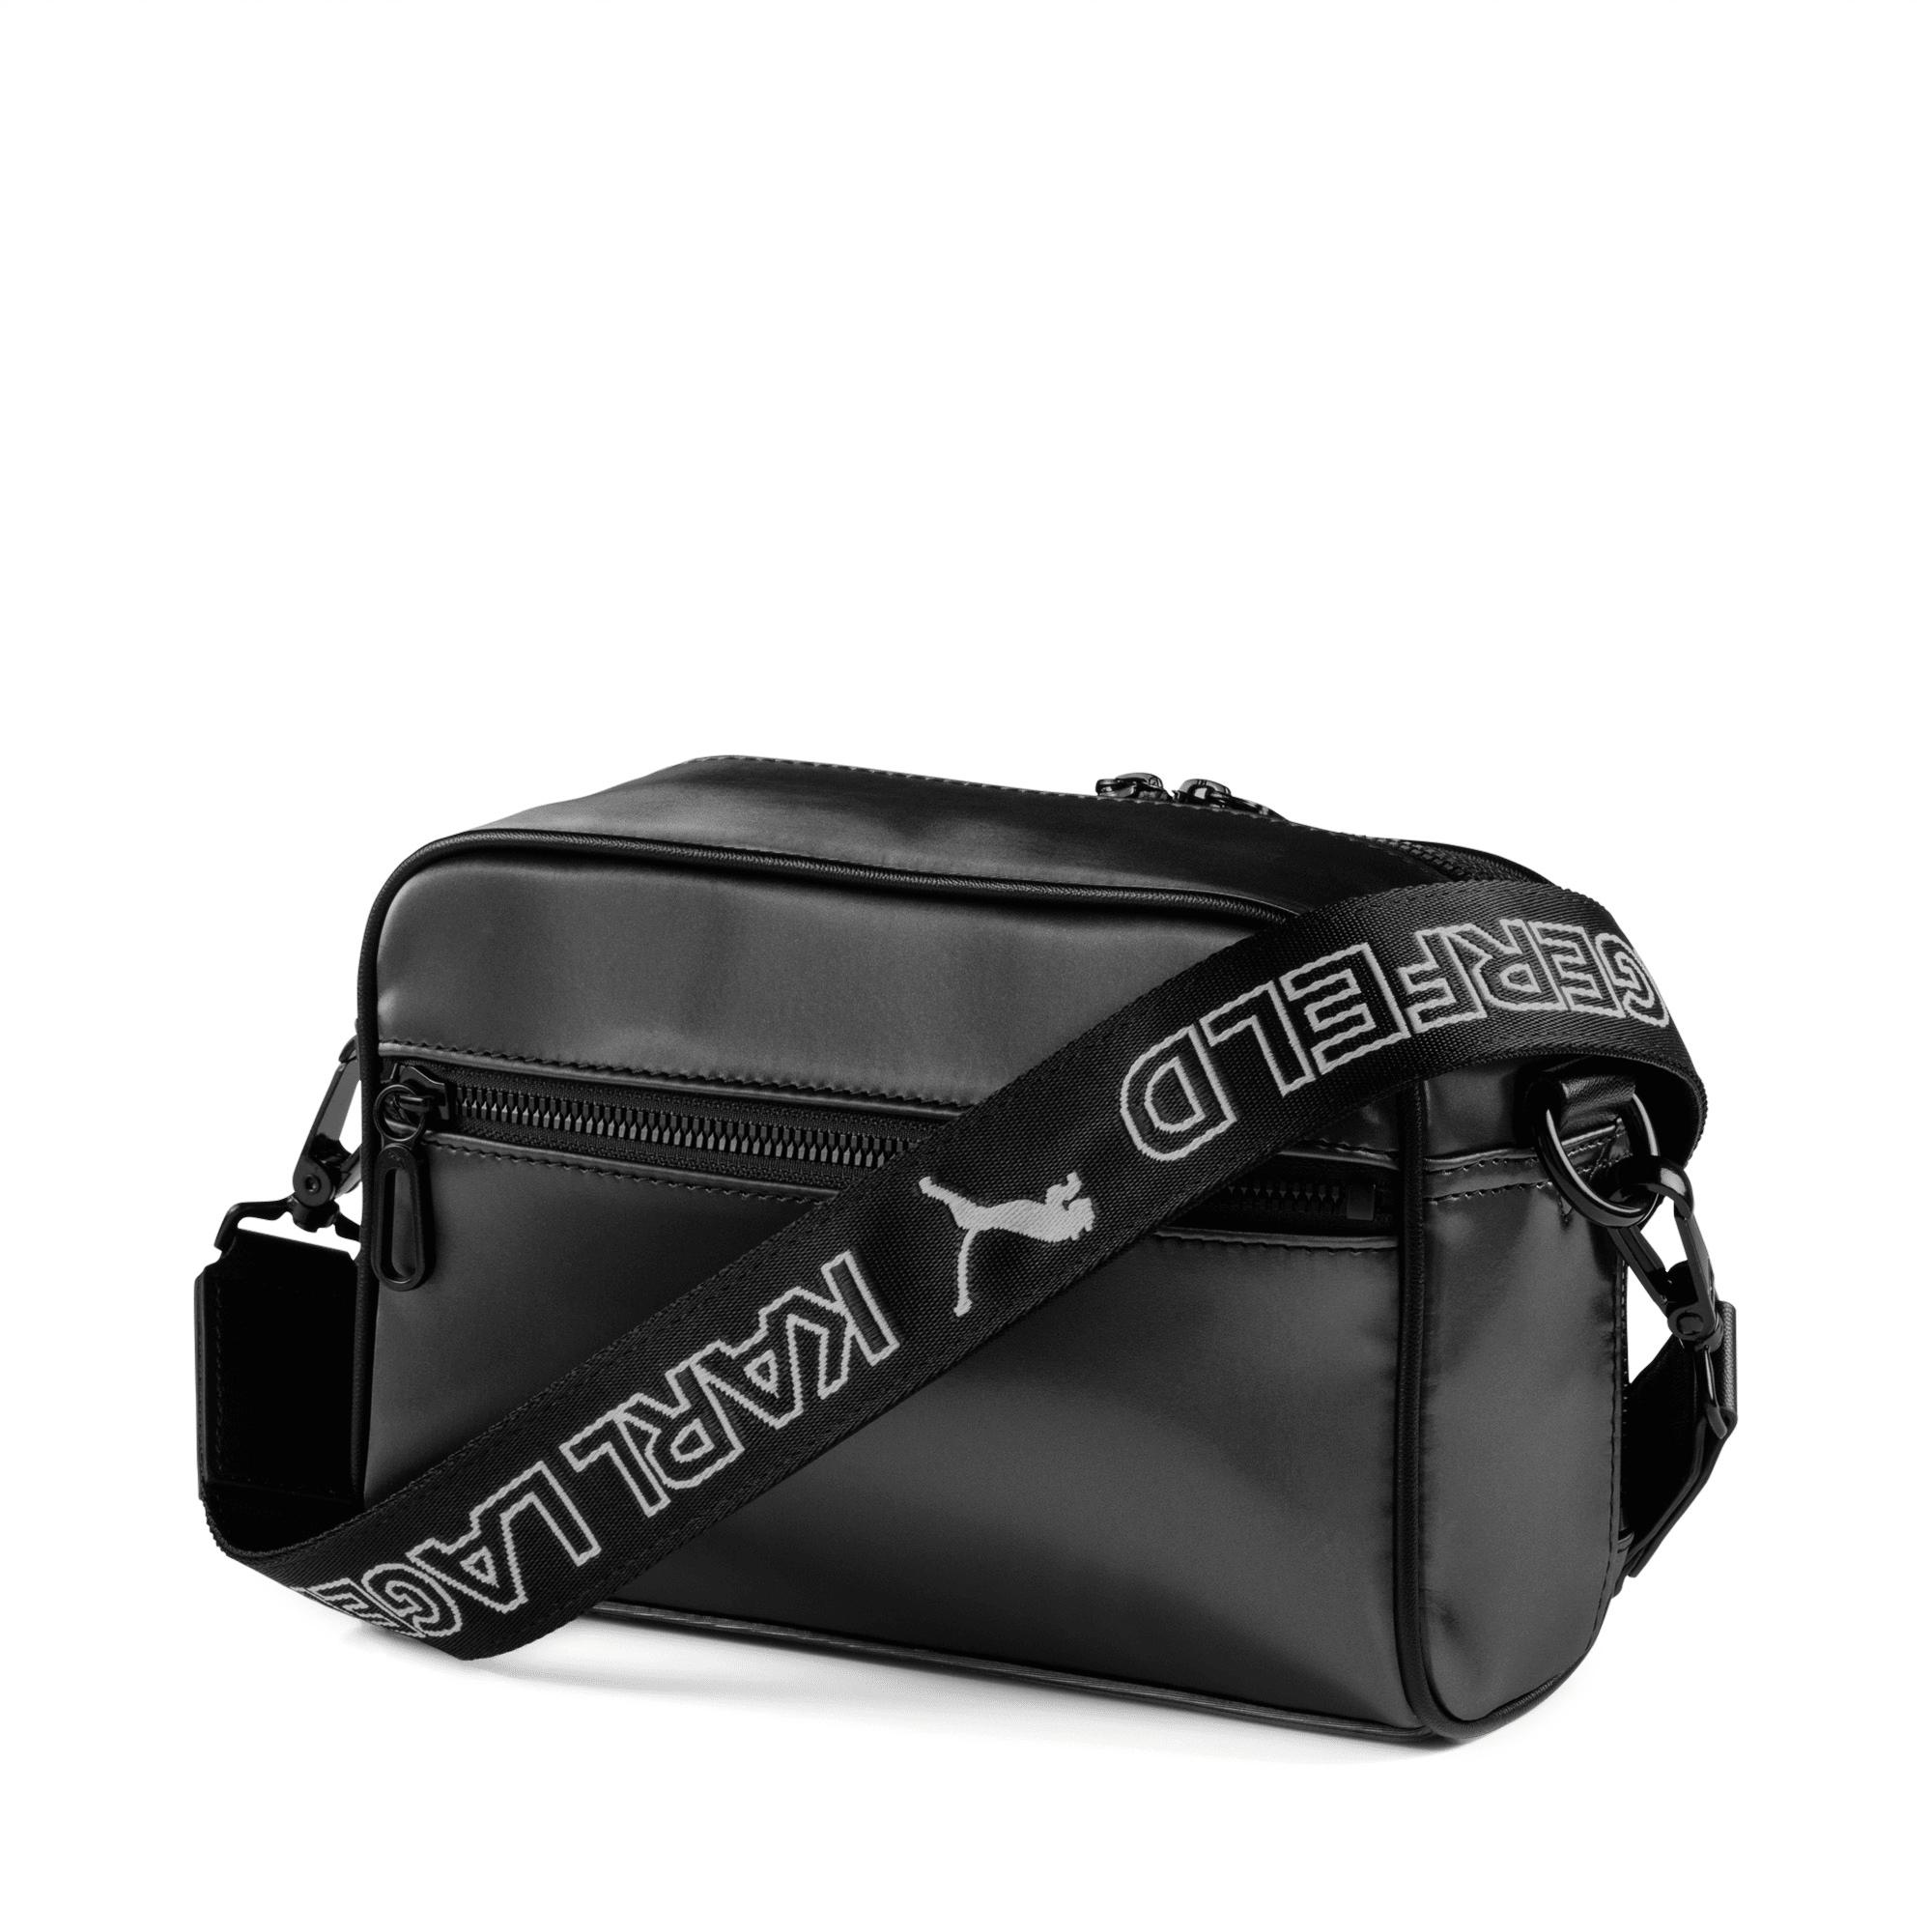 PUMA x KARL LAGERFELD Small Shoulder Bag